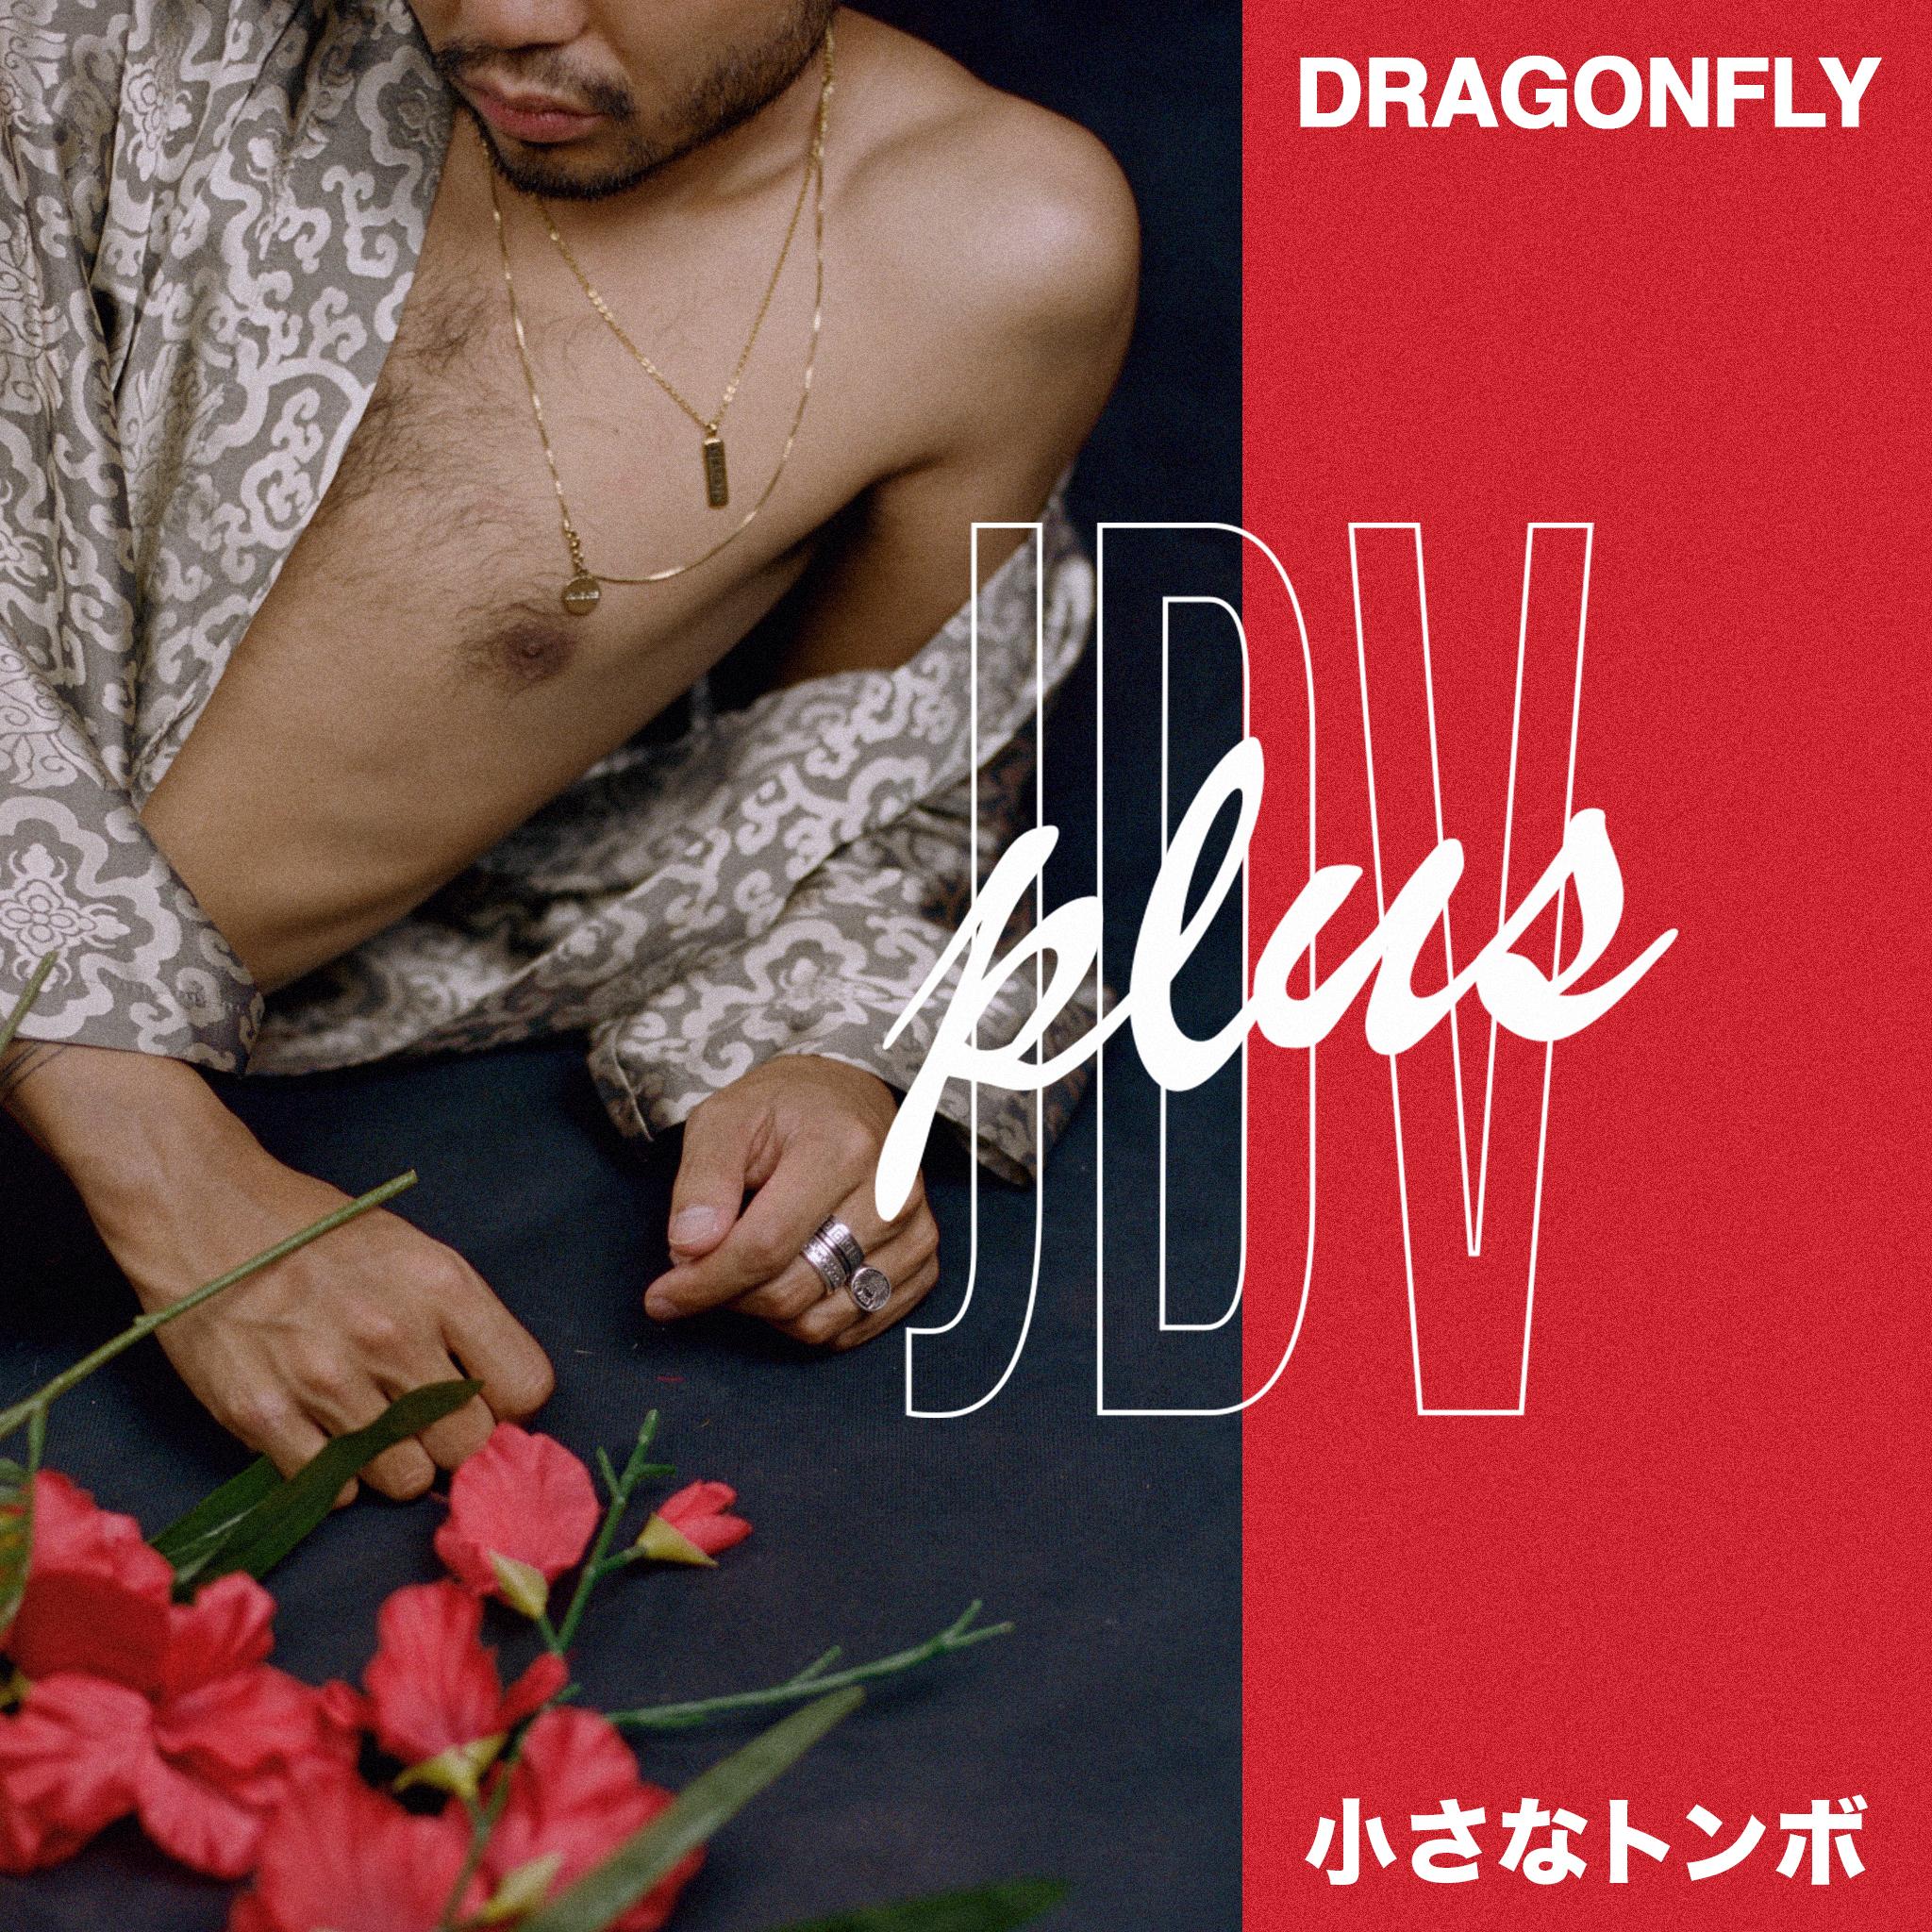 Dragonfly_Artwork.jpg